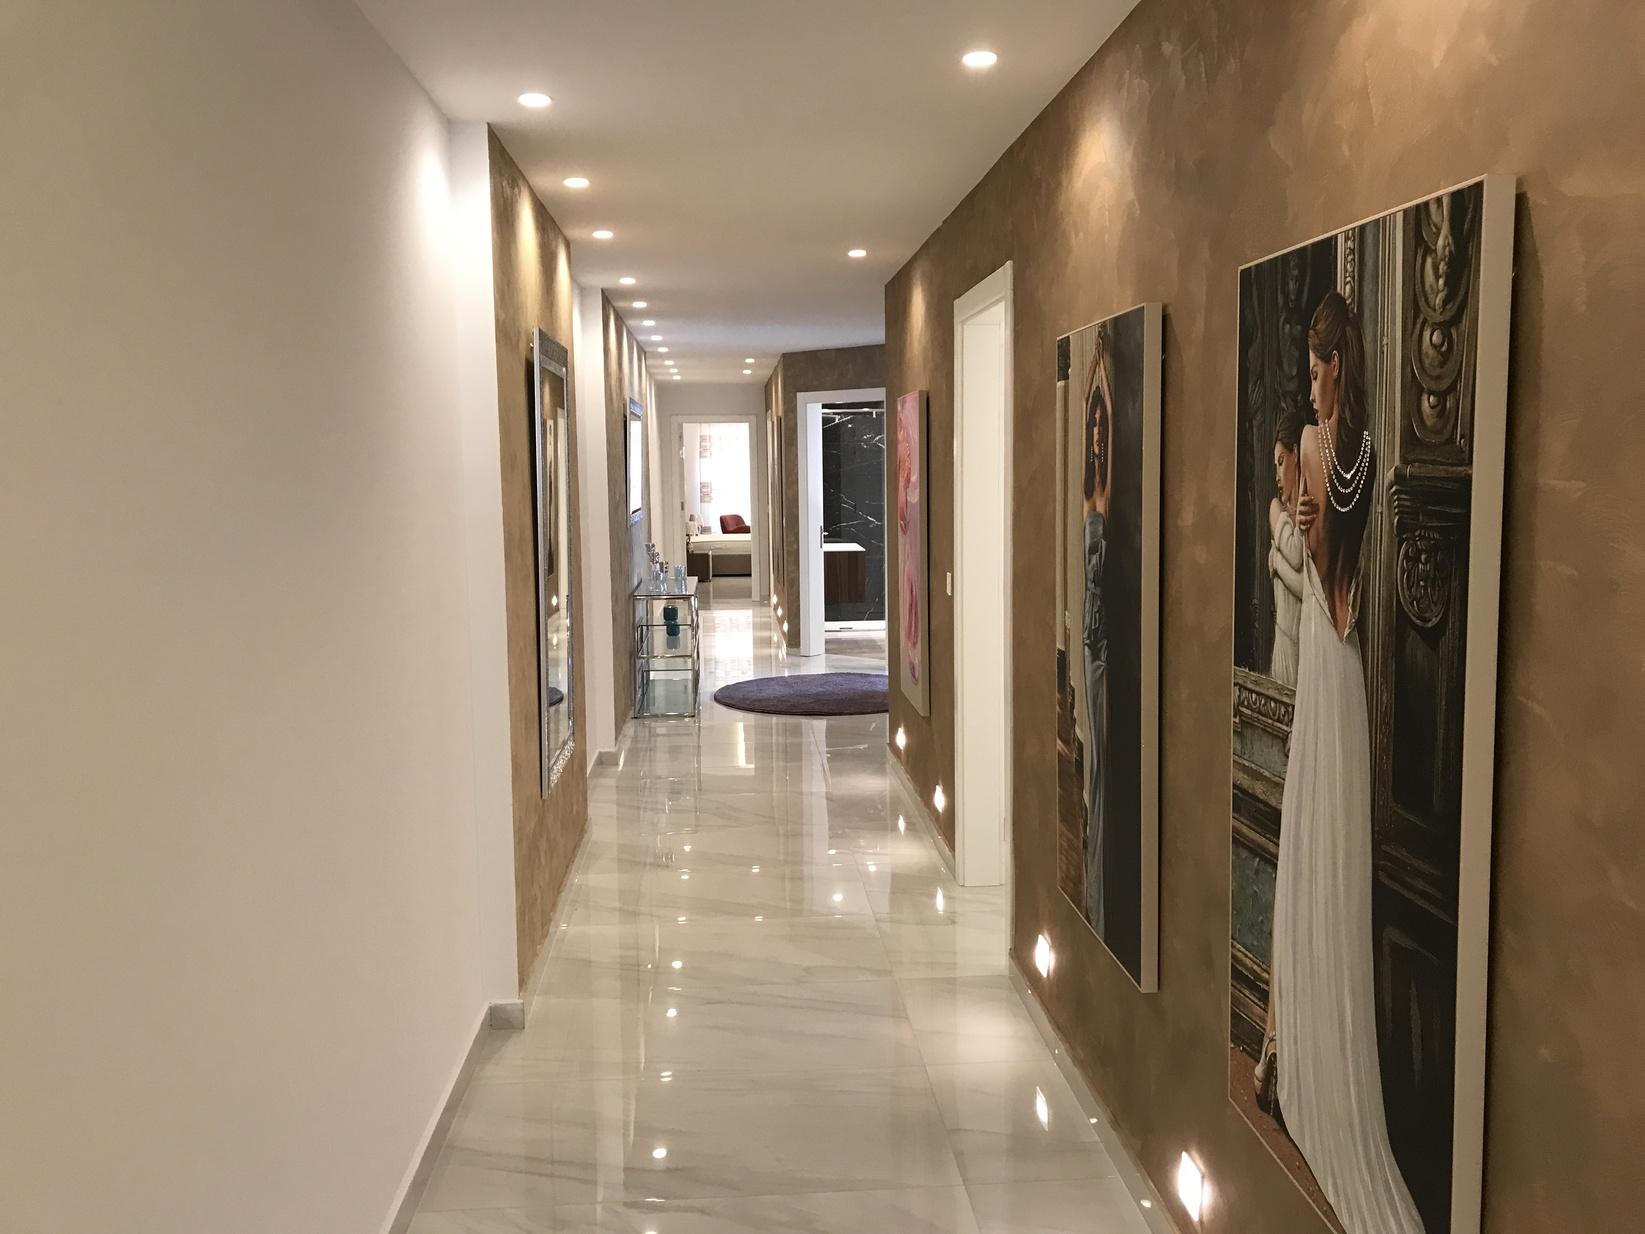 3 bed Apartment For Rent in Qawra, Qawra - thumb 13